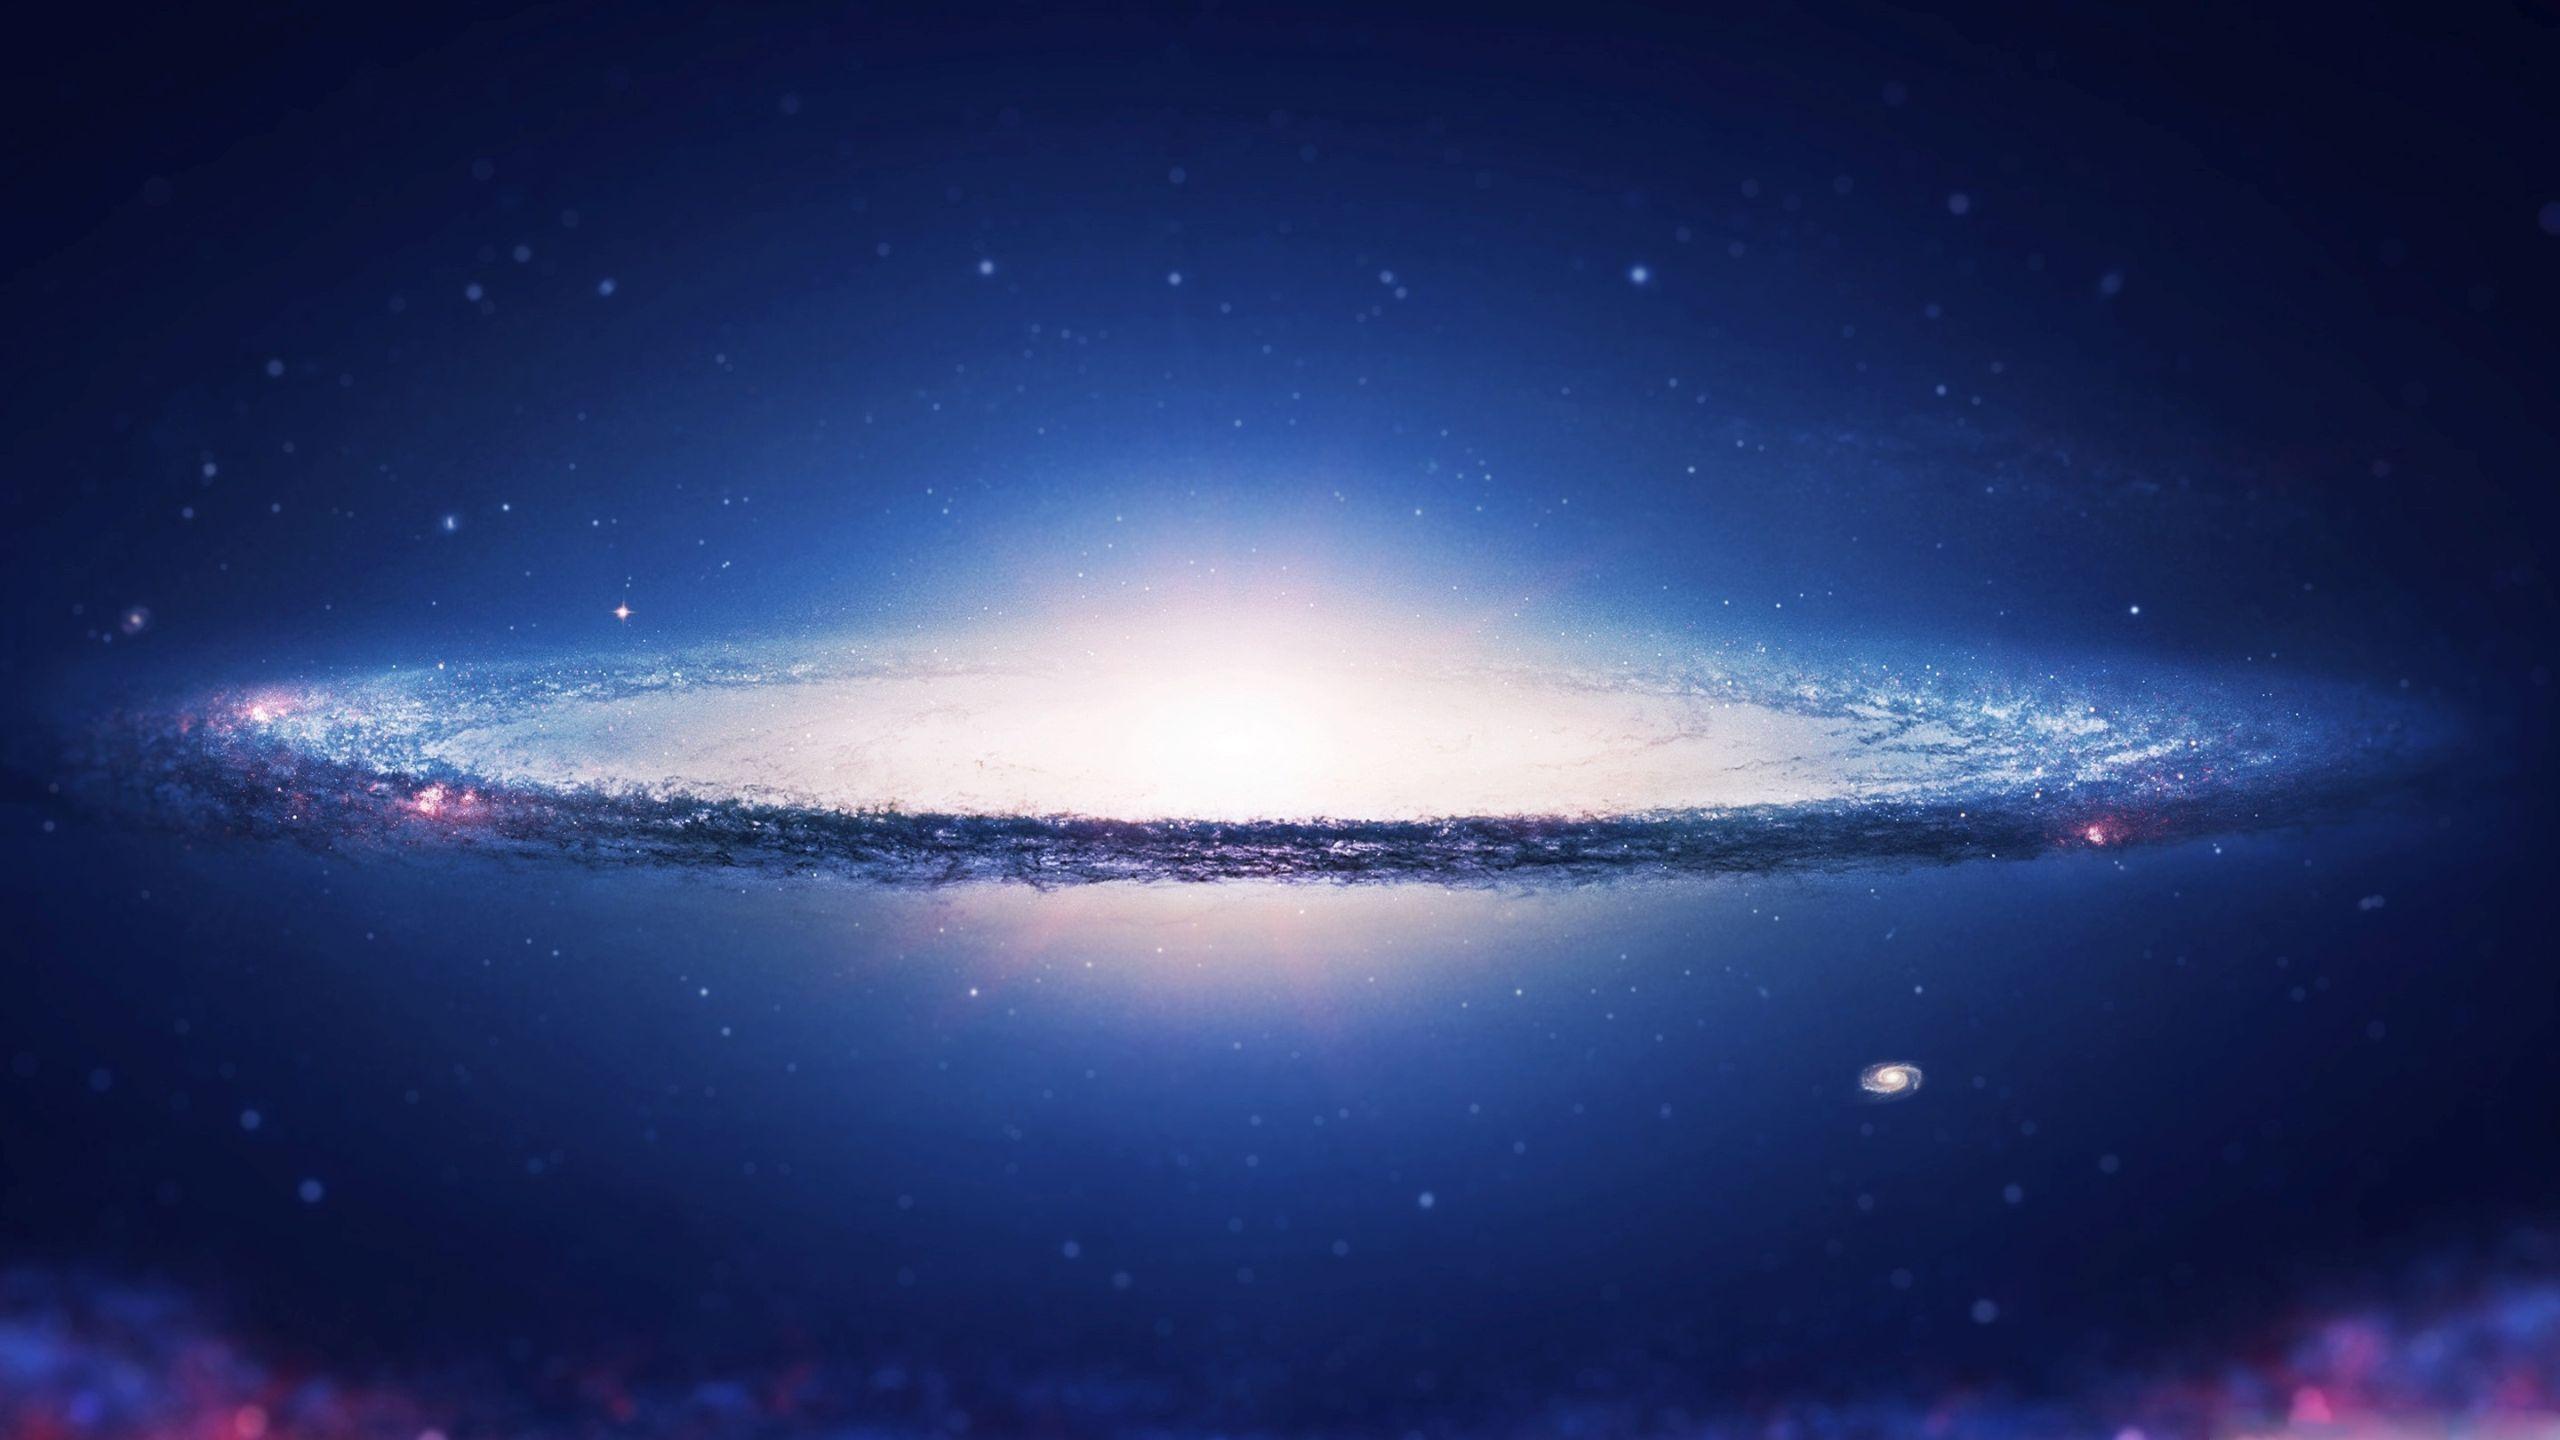 Galaxie Fond Décran 2560x1440 Fond Décran Hd